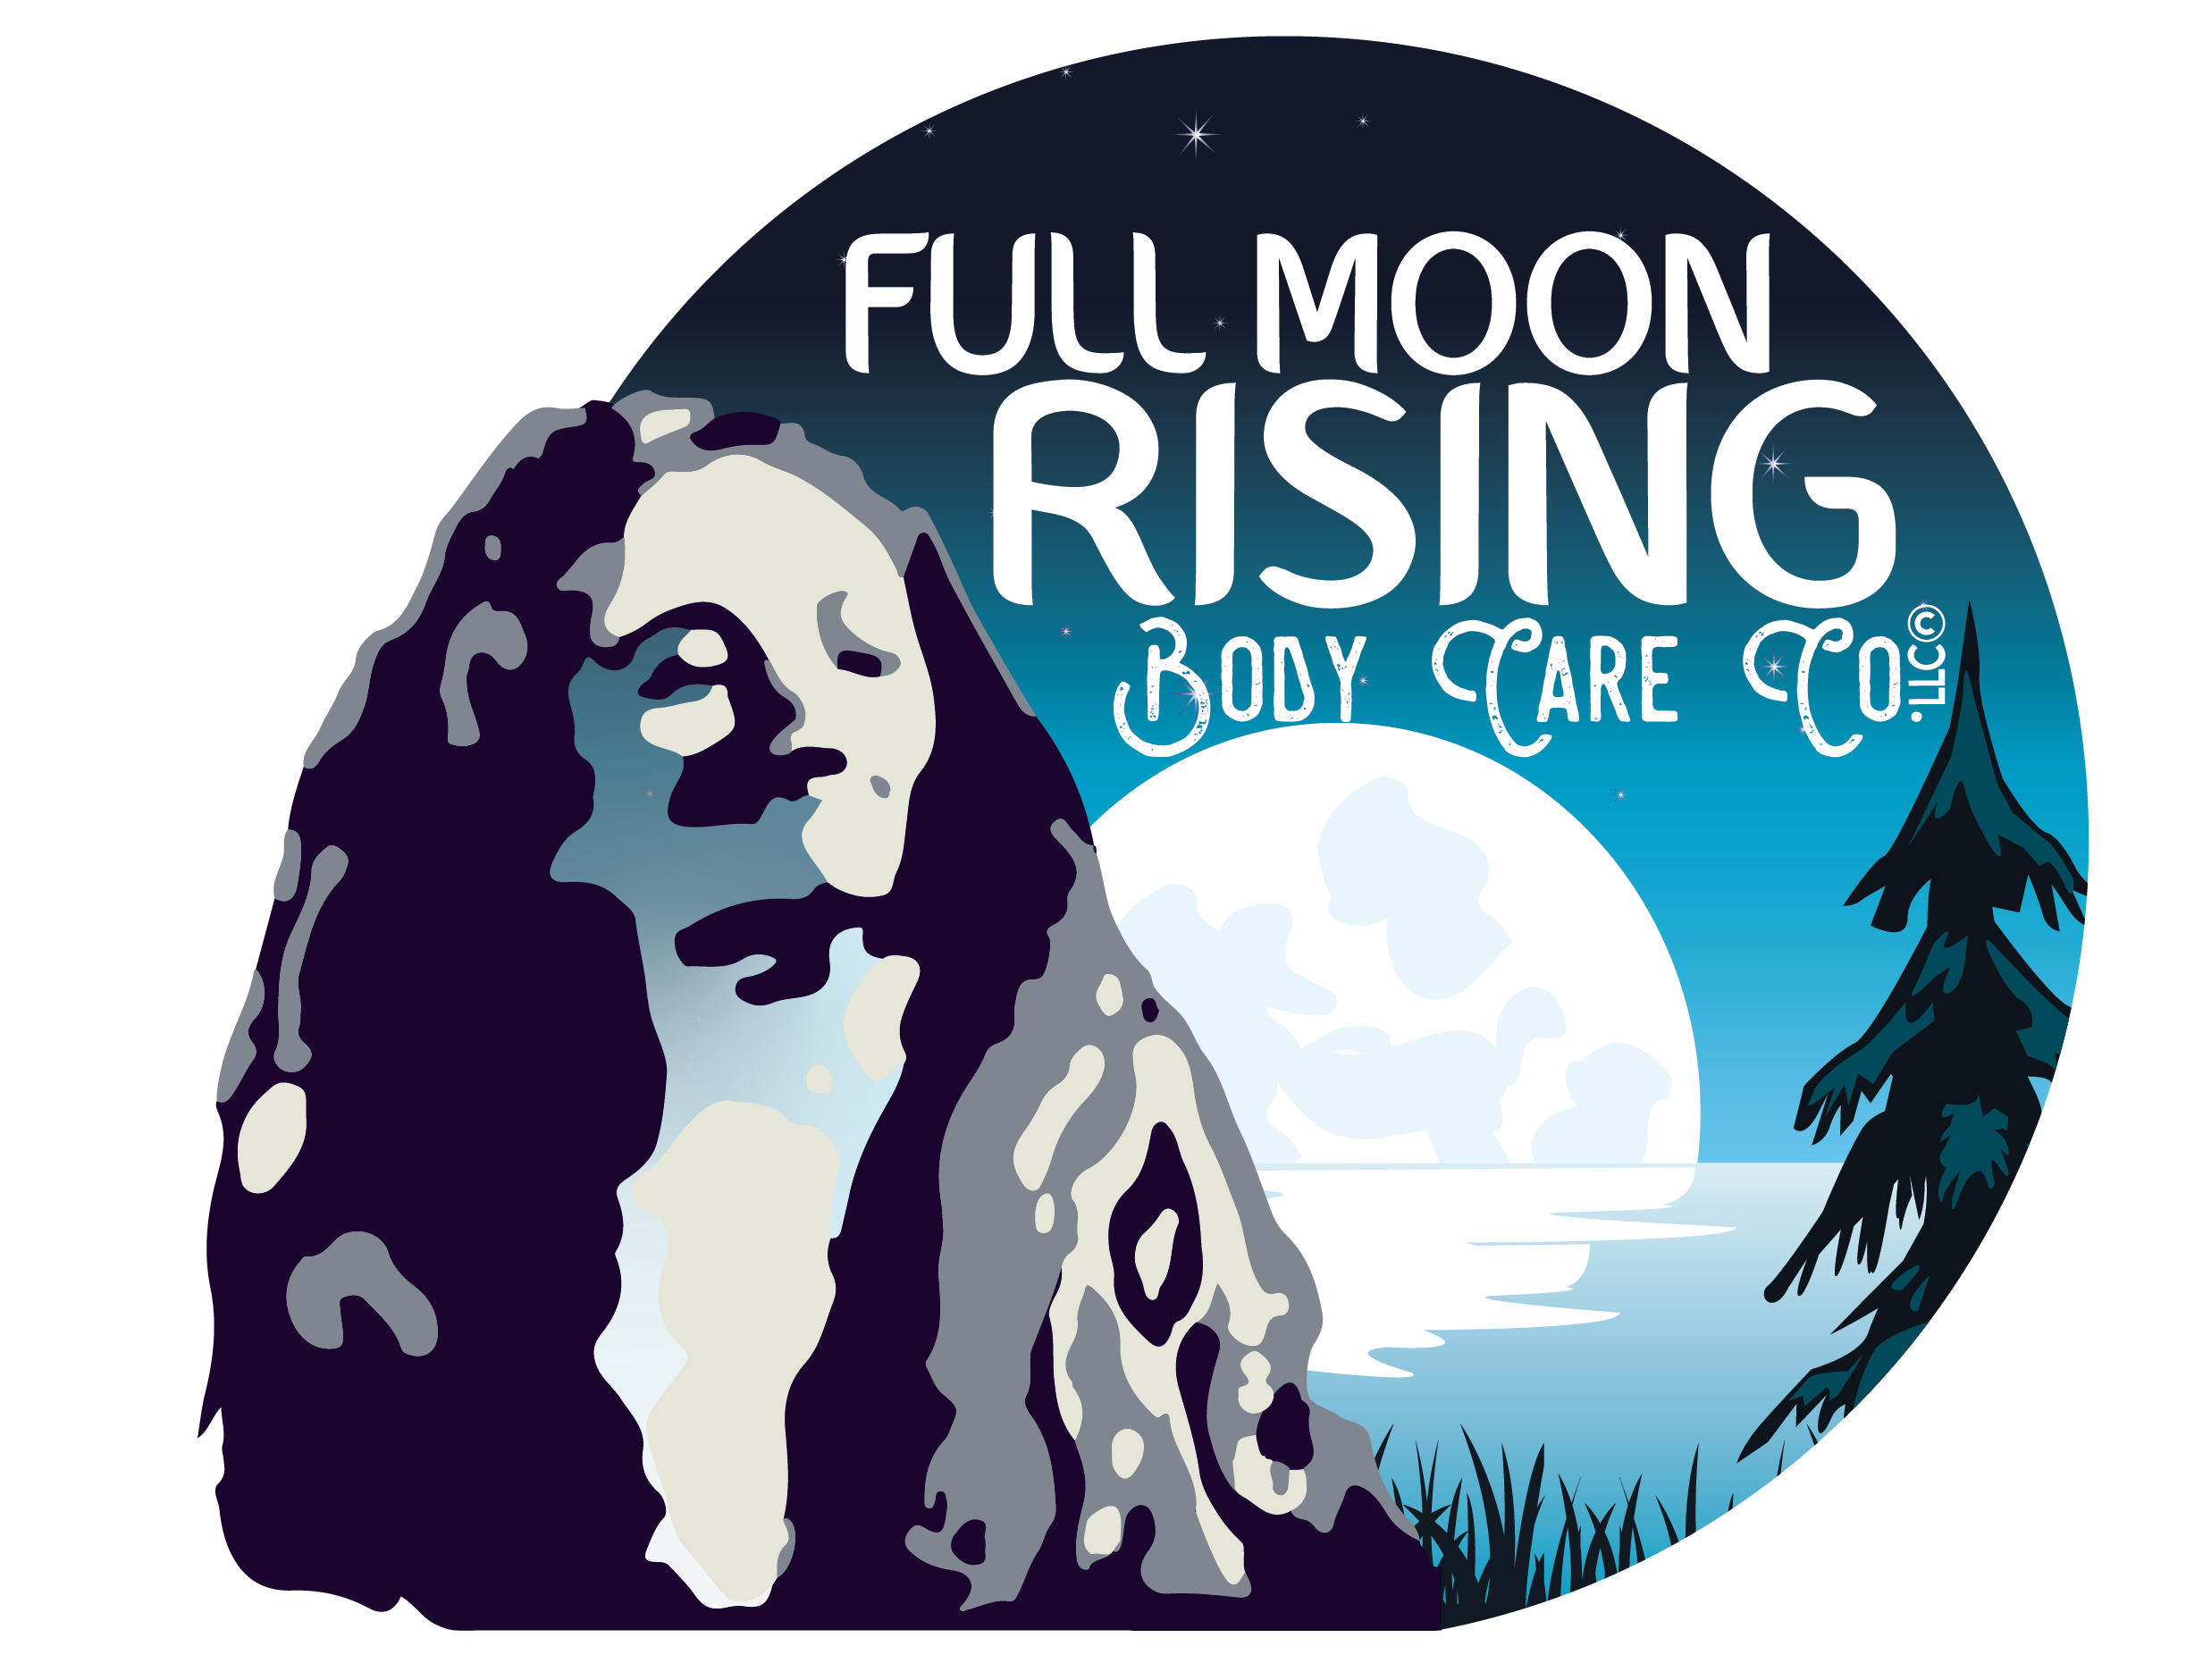 Full Moon Rising Body Care Co